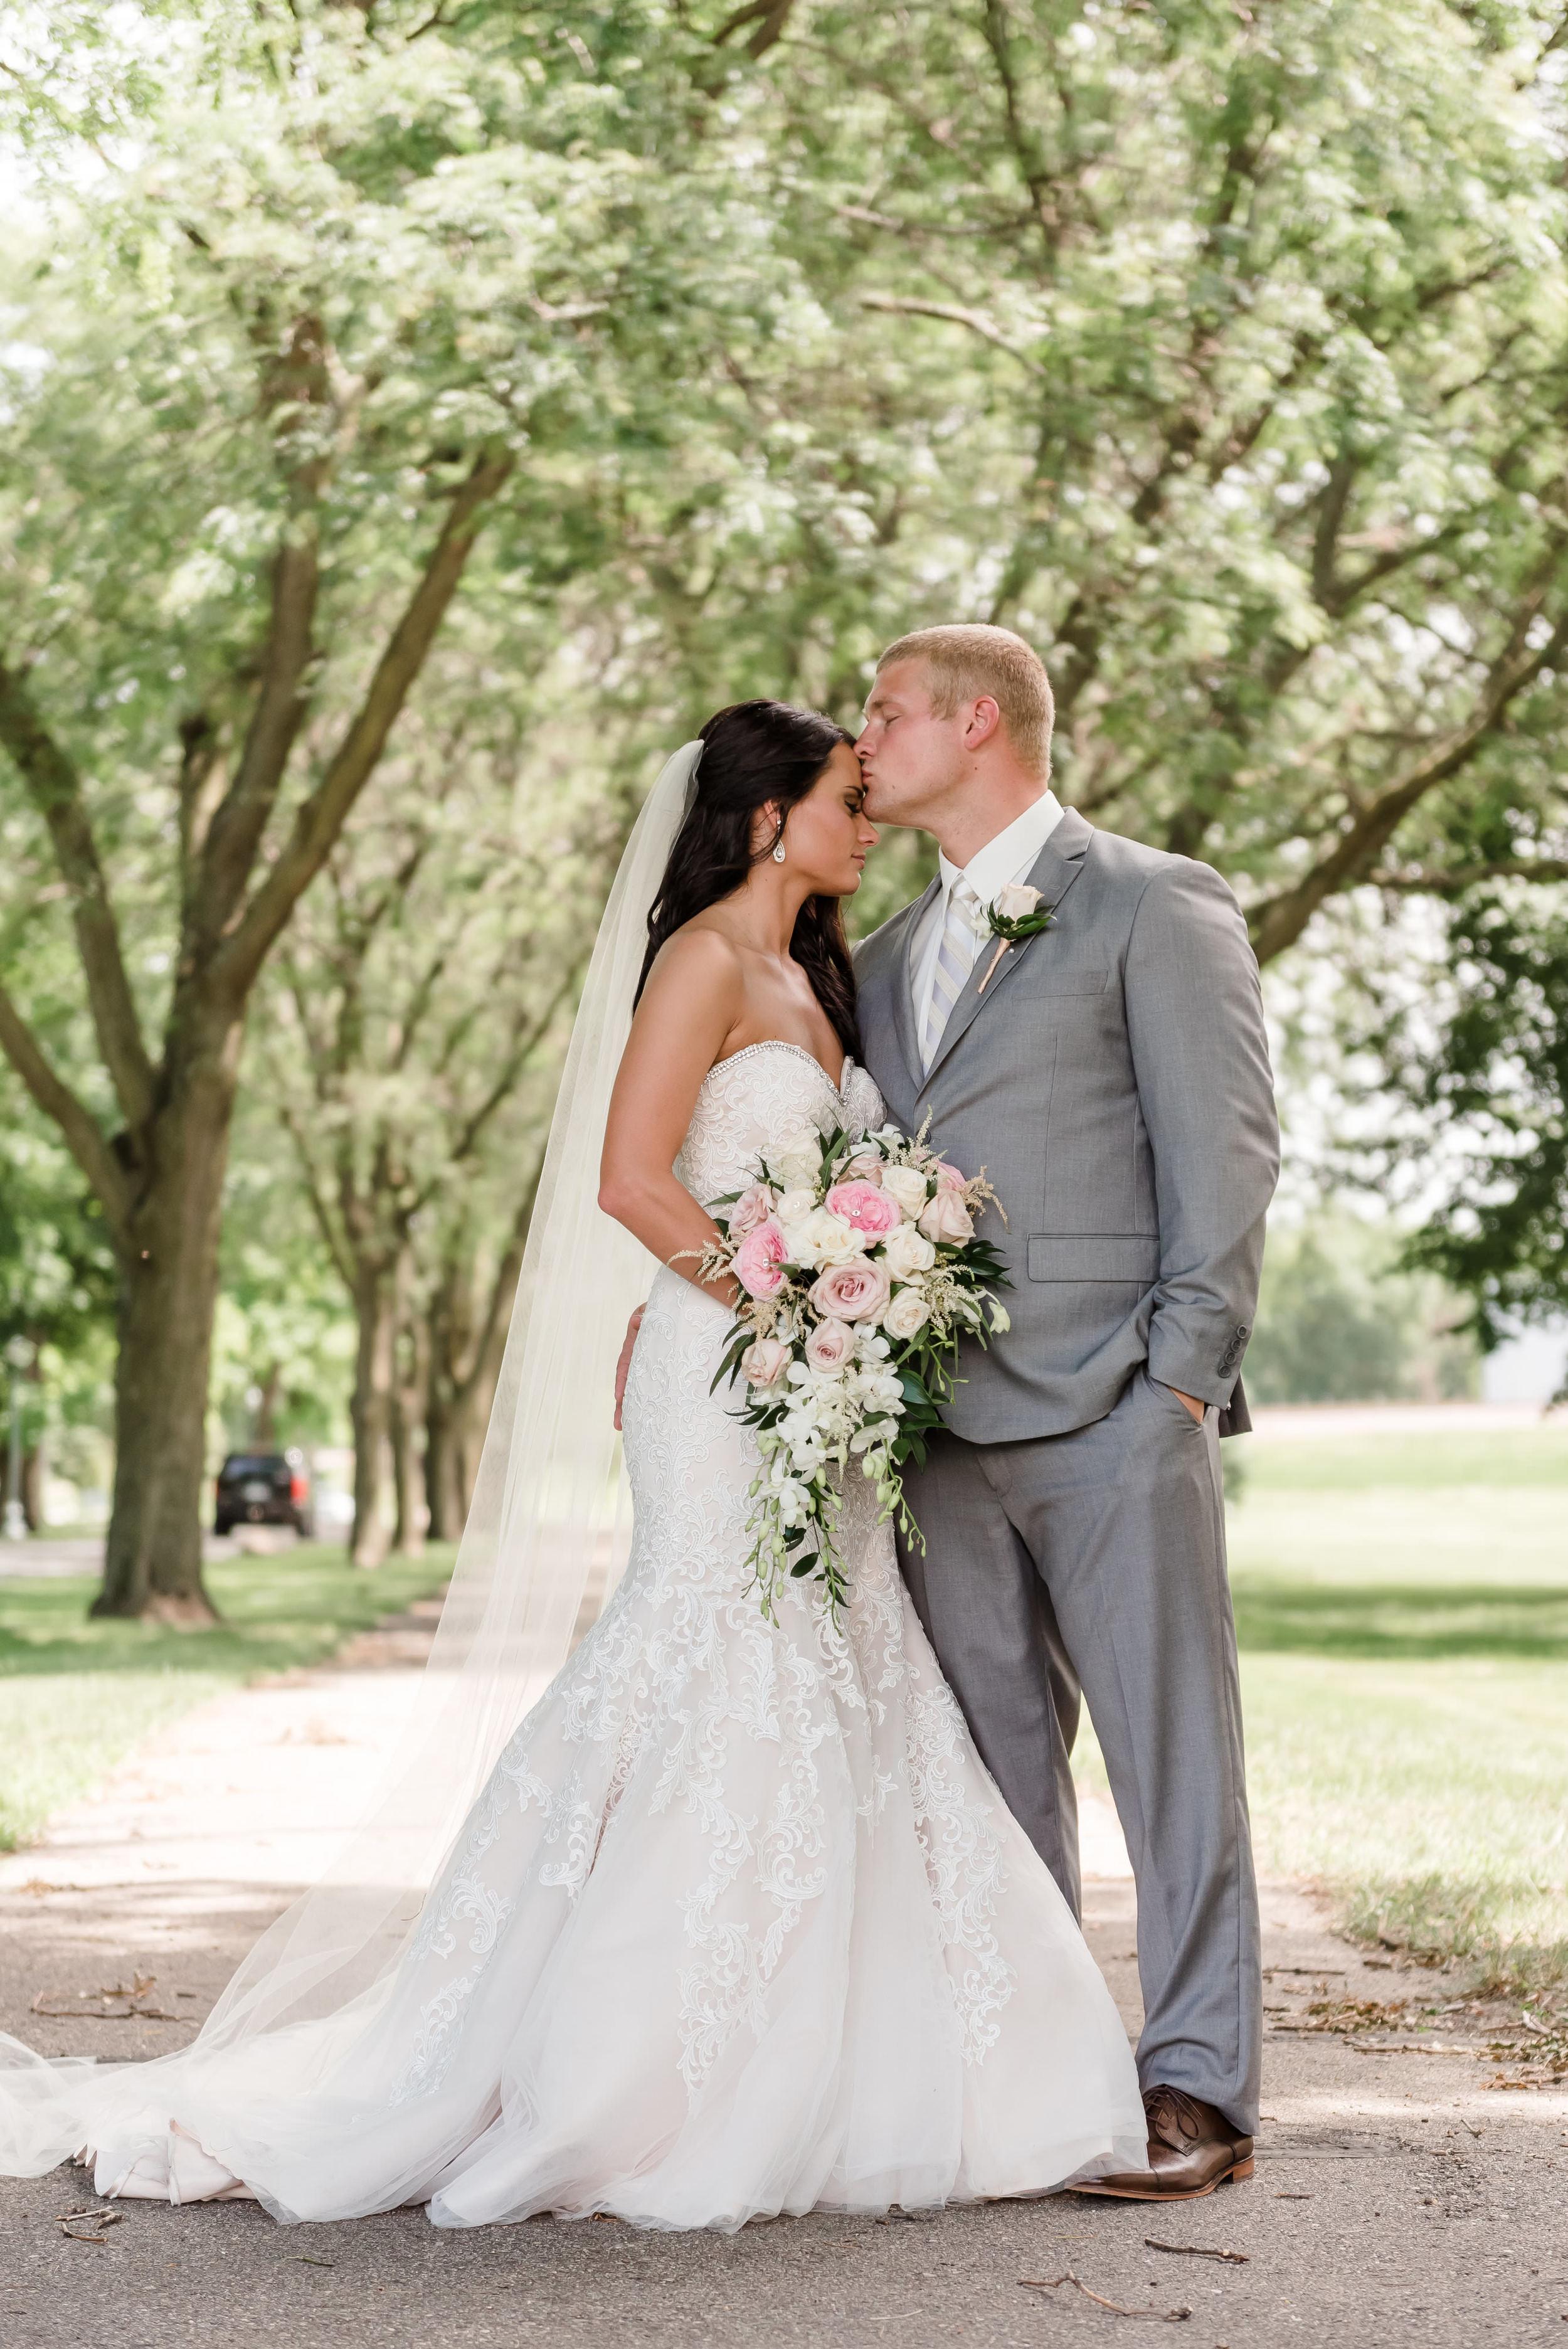 Layce and Brandon - Wedding - Outdoor Portraits-94.jpg